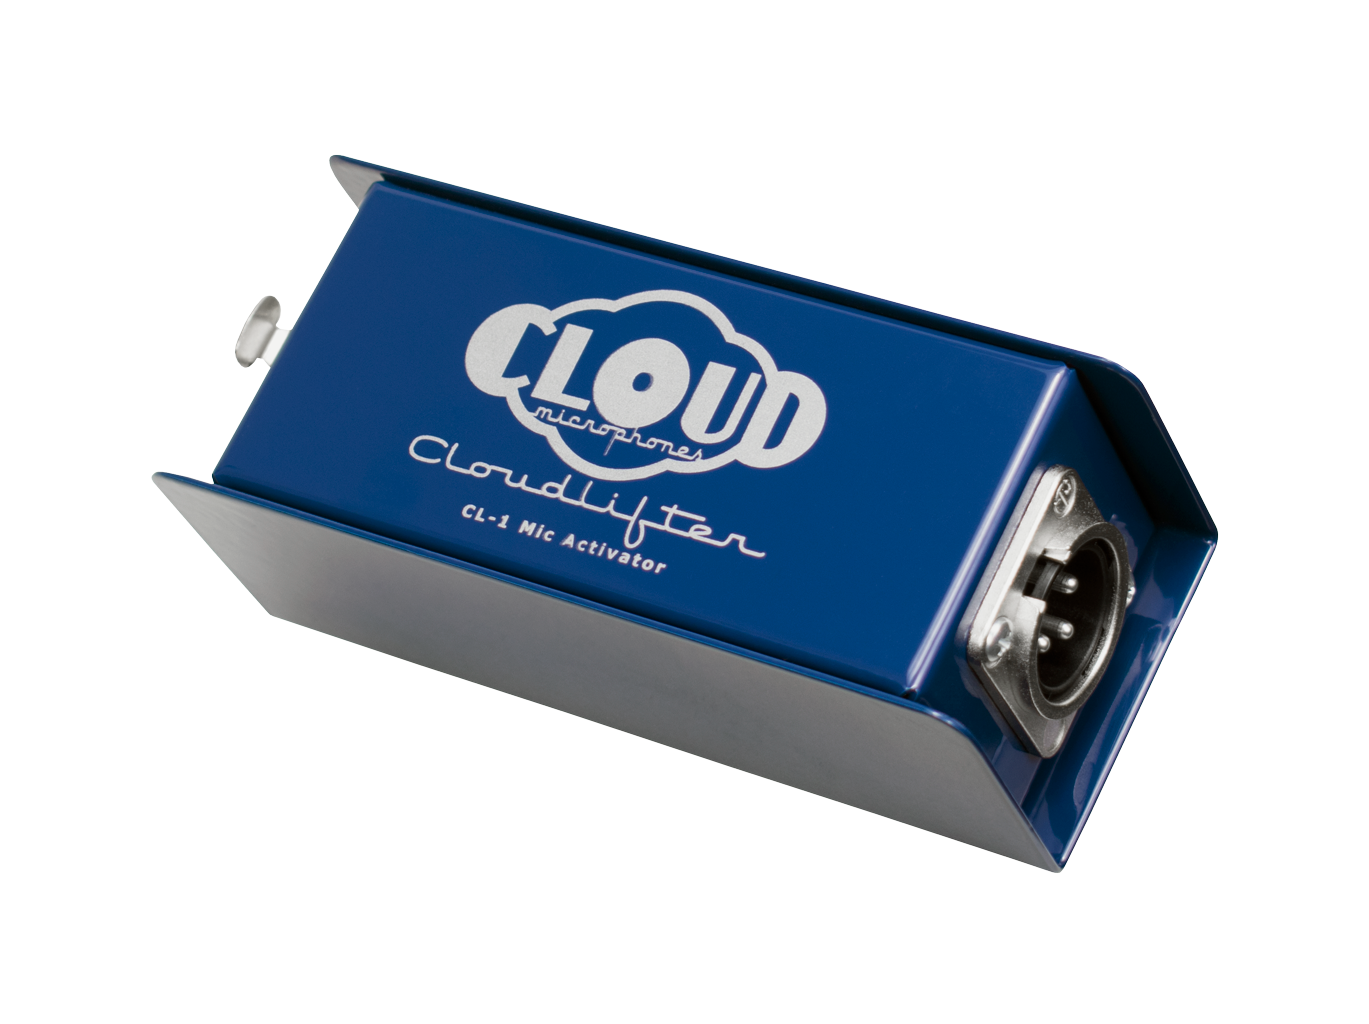 Cloudlifter CL-Zi | Cloud Microphones